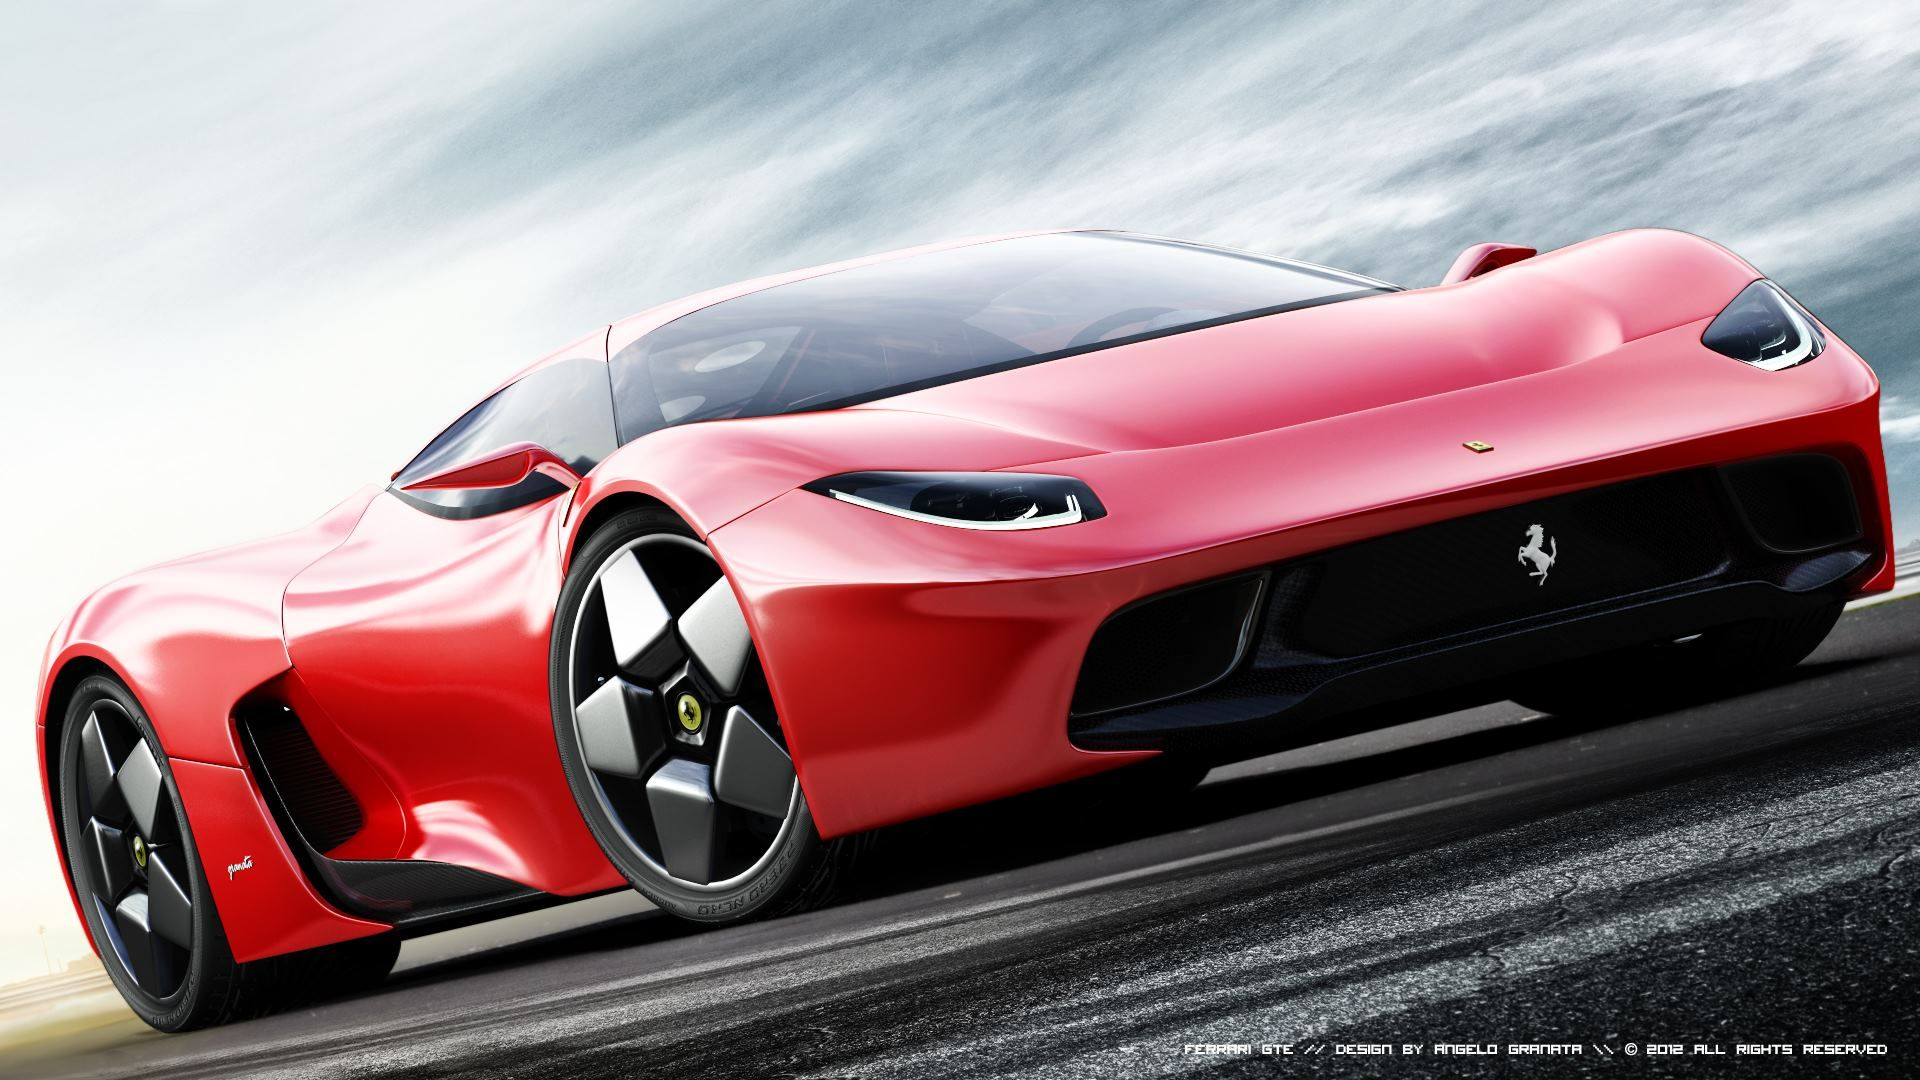 Ferrari Gte Hdr1 Http Jx83395757 Com Ferrari Gte Hdr1 Ferrari Mobil Konsep